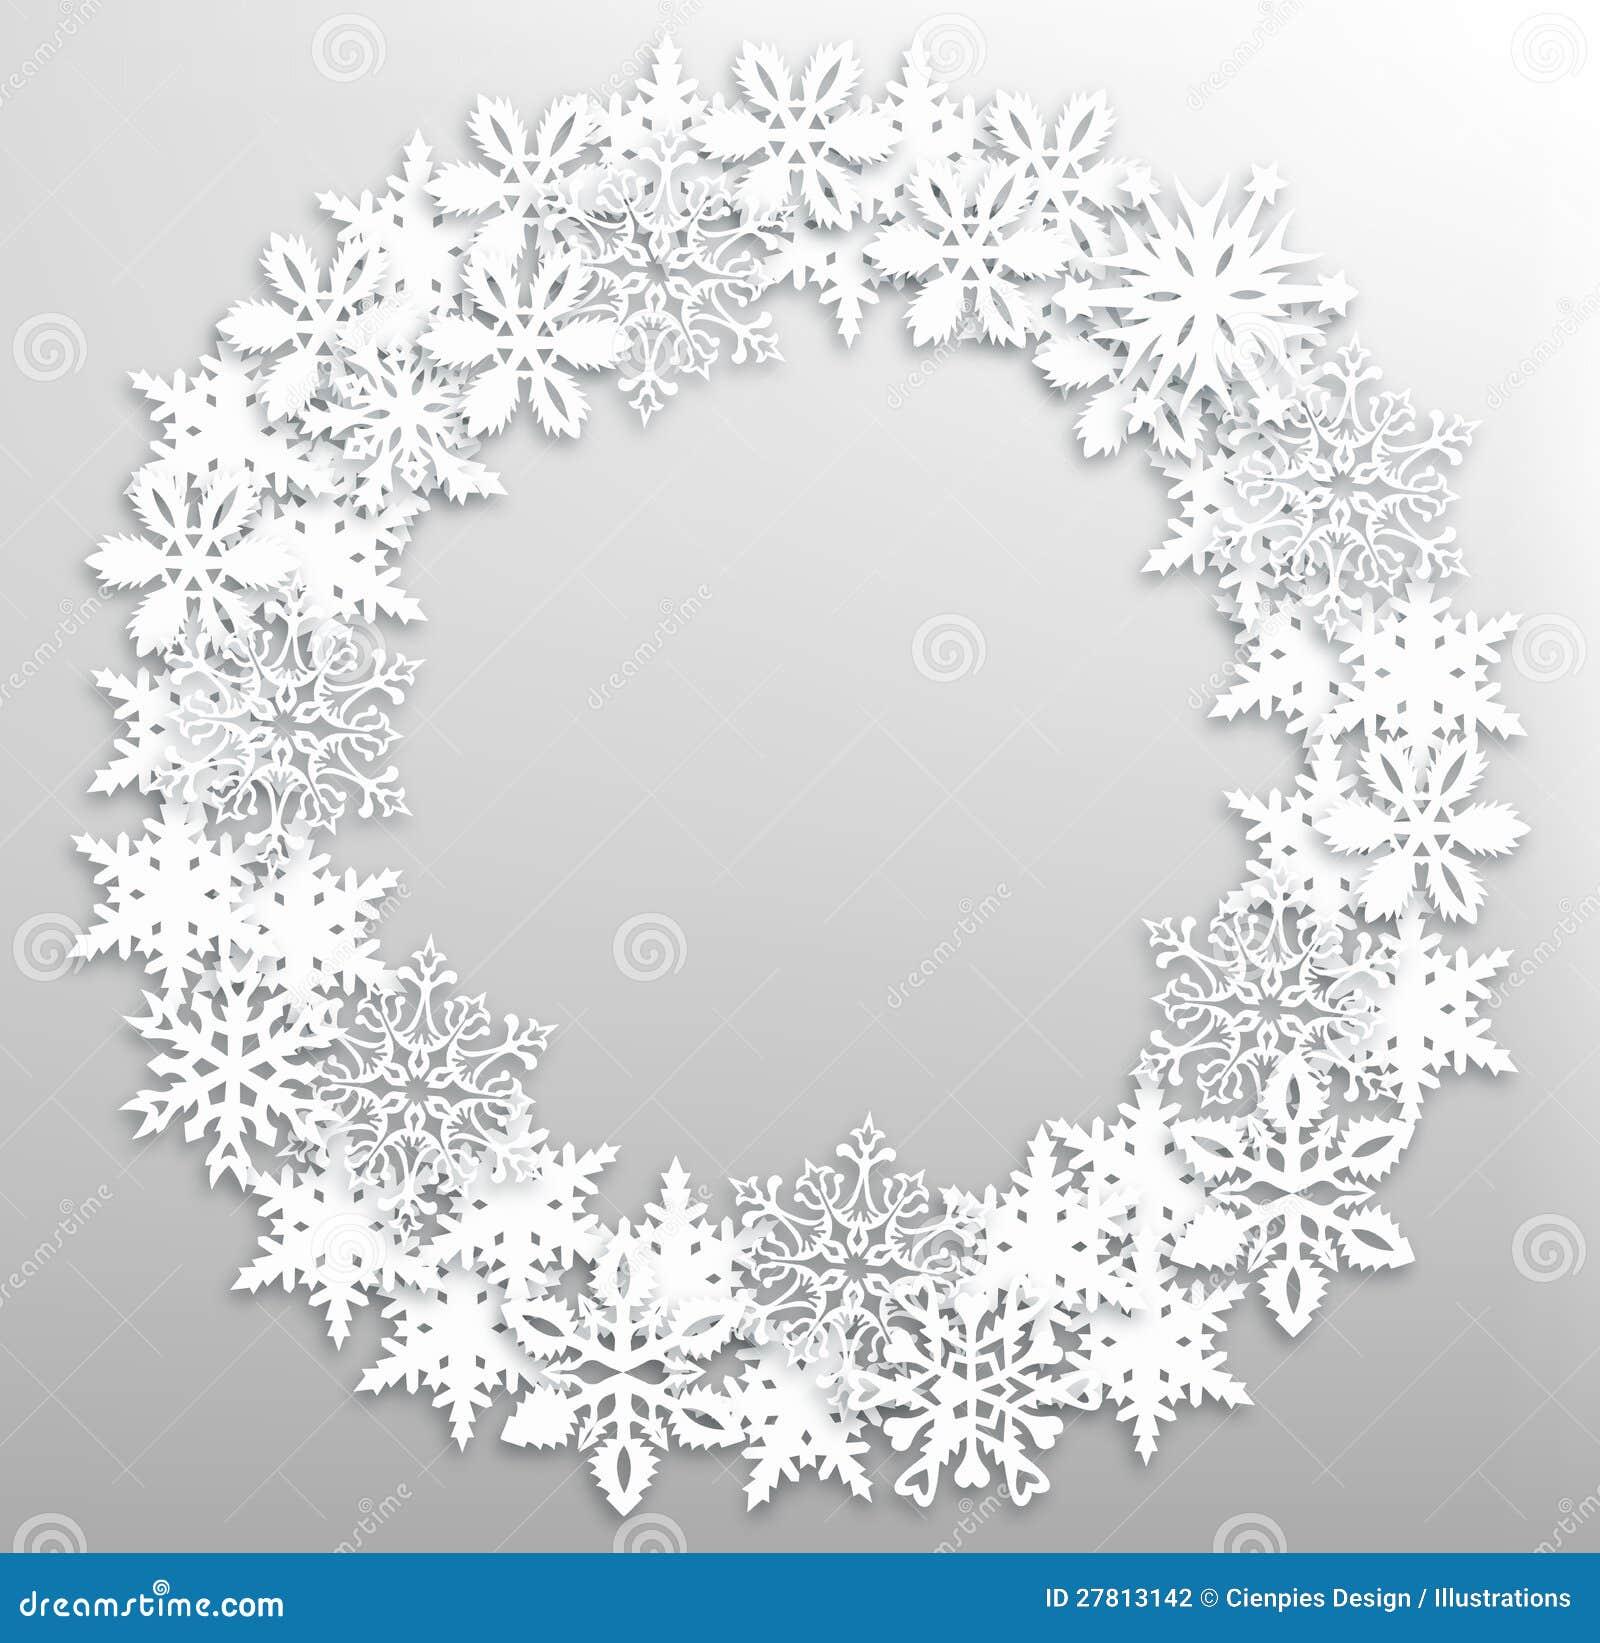 Christmas Snowflakes Wreath Stock Photography - Image ...